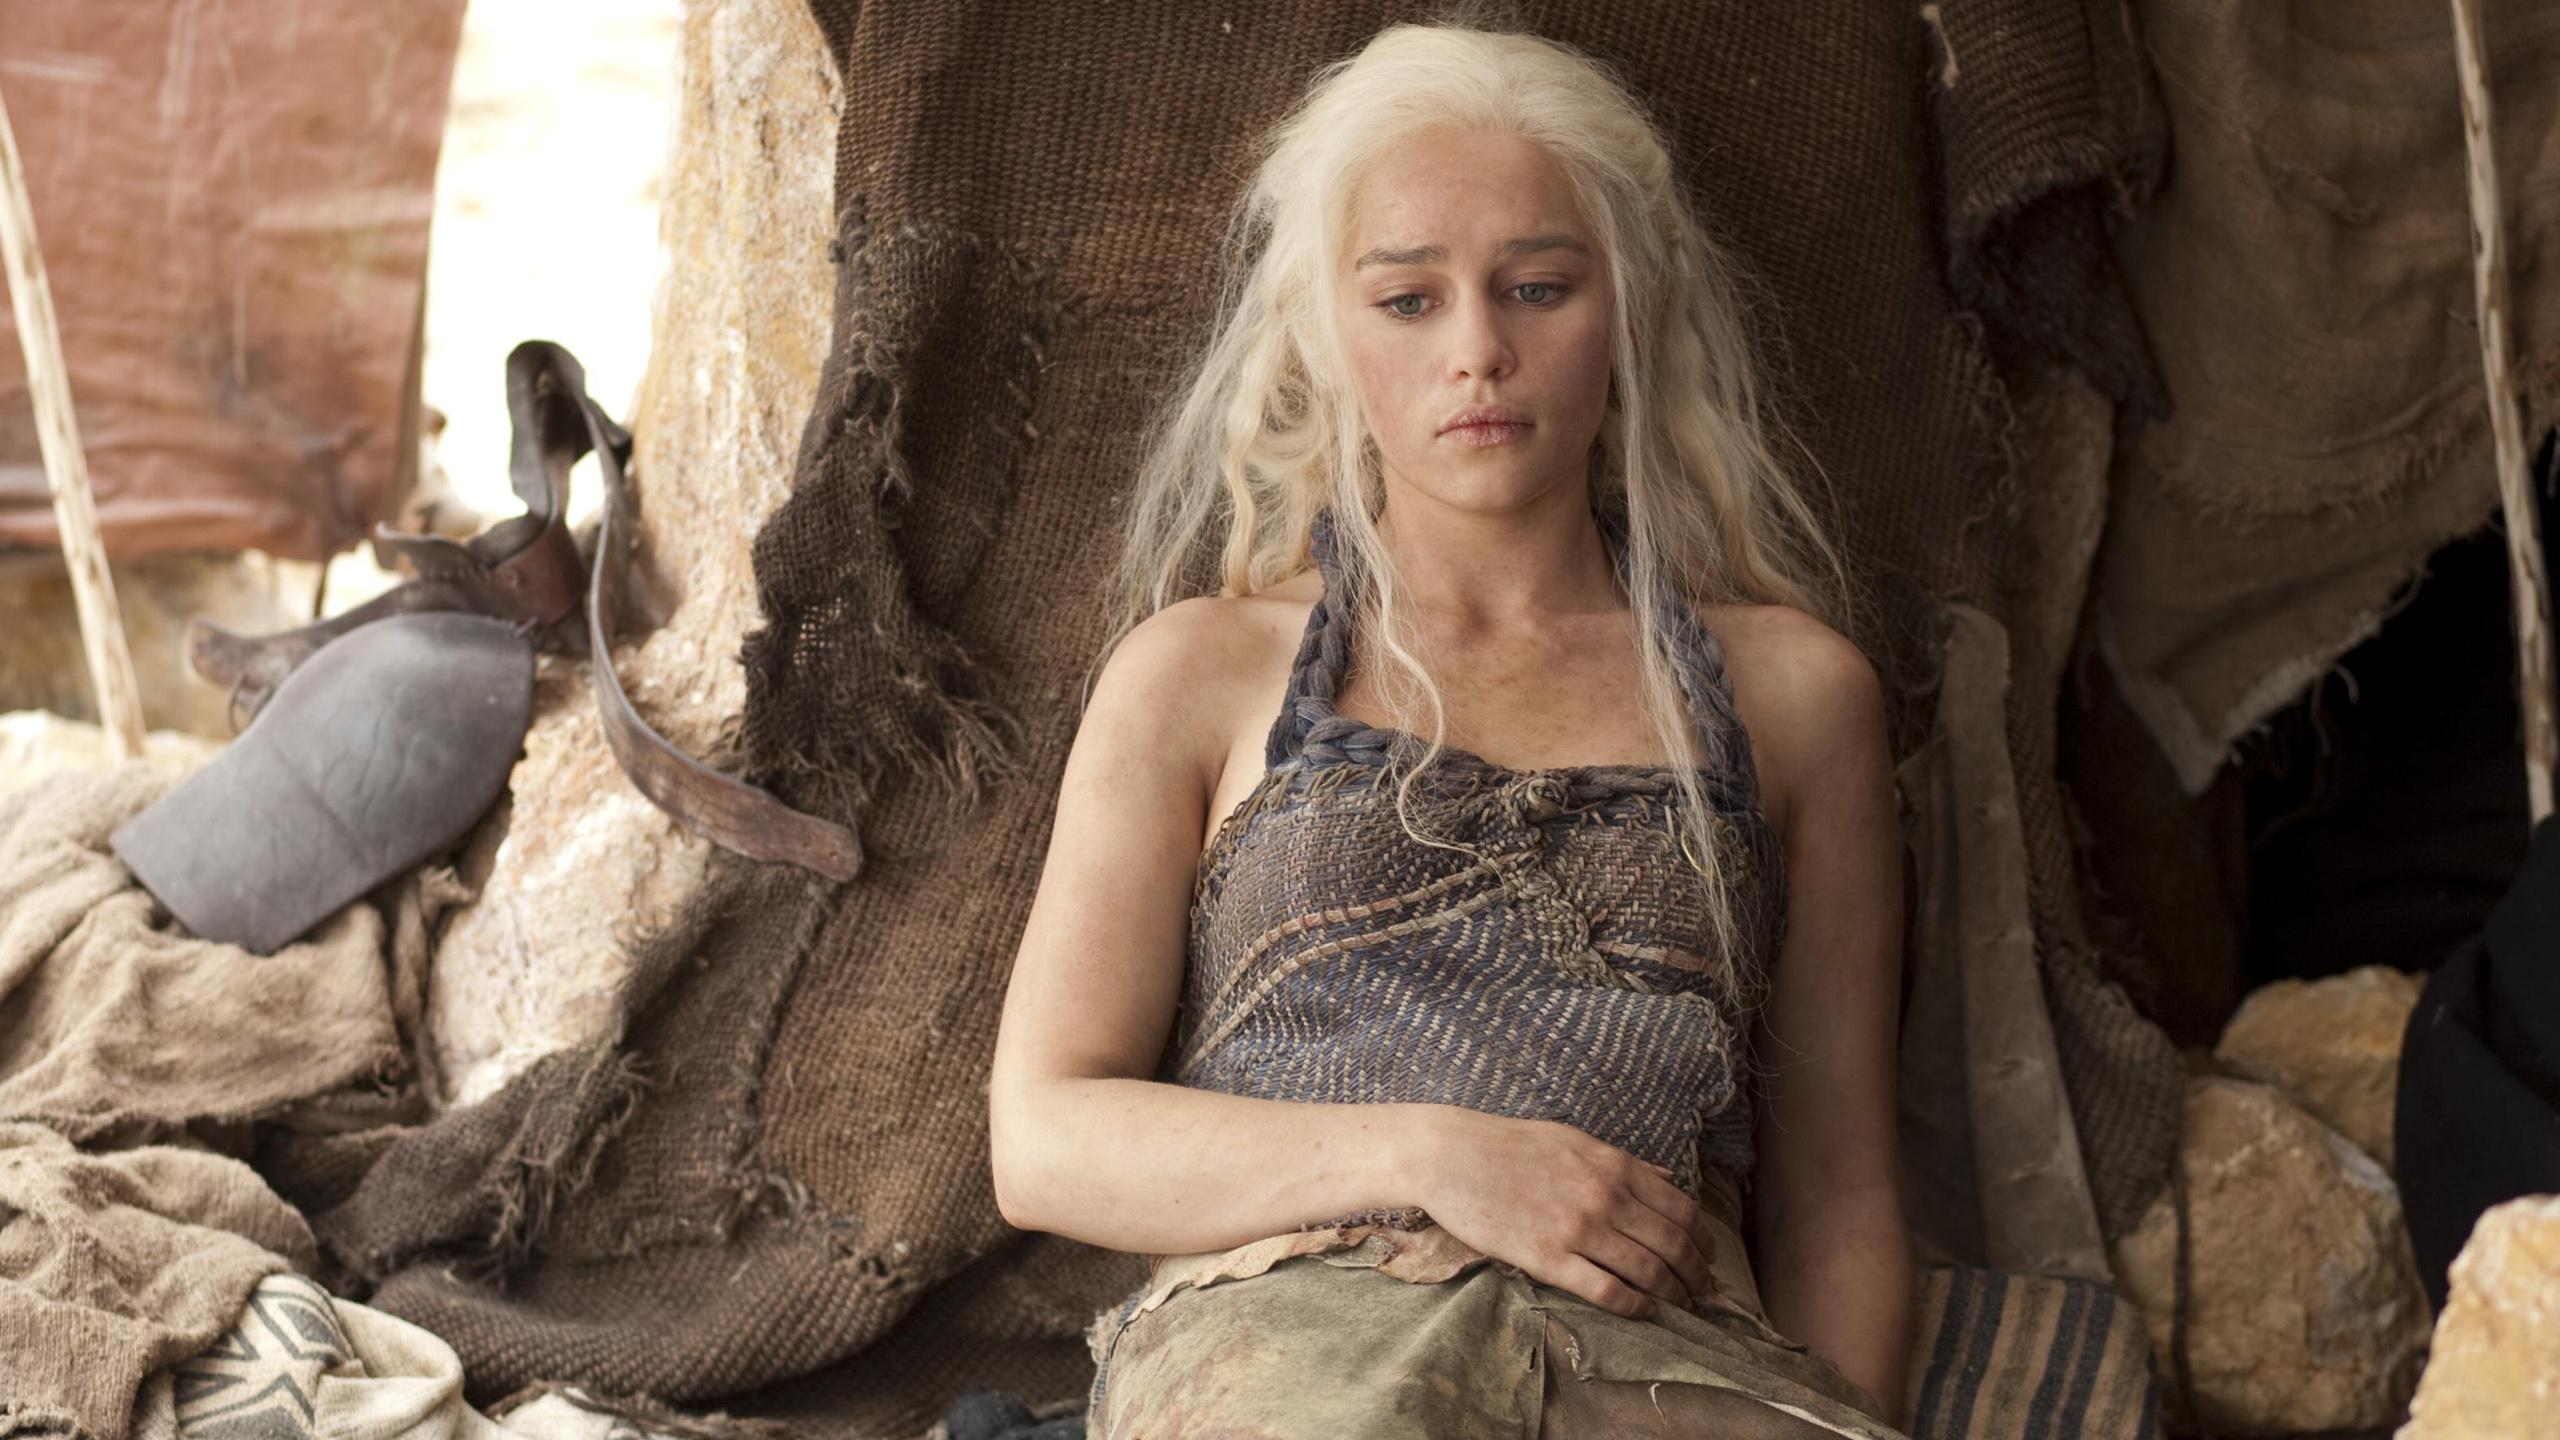 http://fr.best-wallpaper.net/wallpaper/2560x1440/1301/Emilia-Clarke-in-Game-of-Thrones_2560x1440.jpg